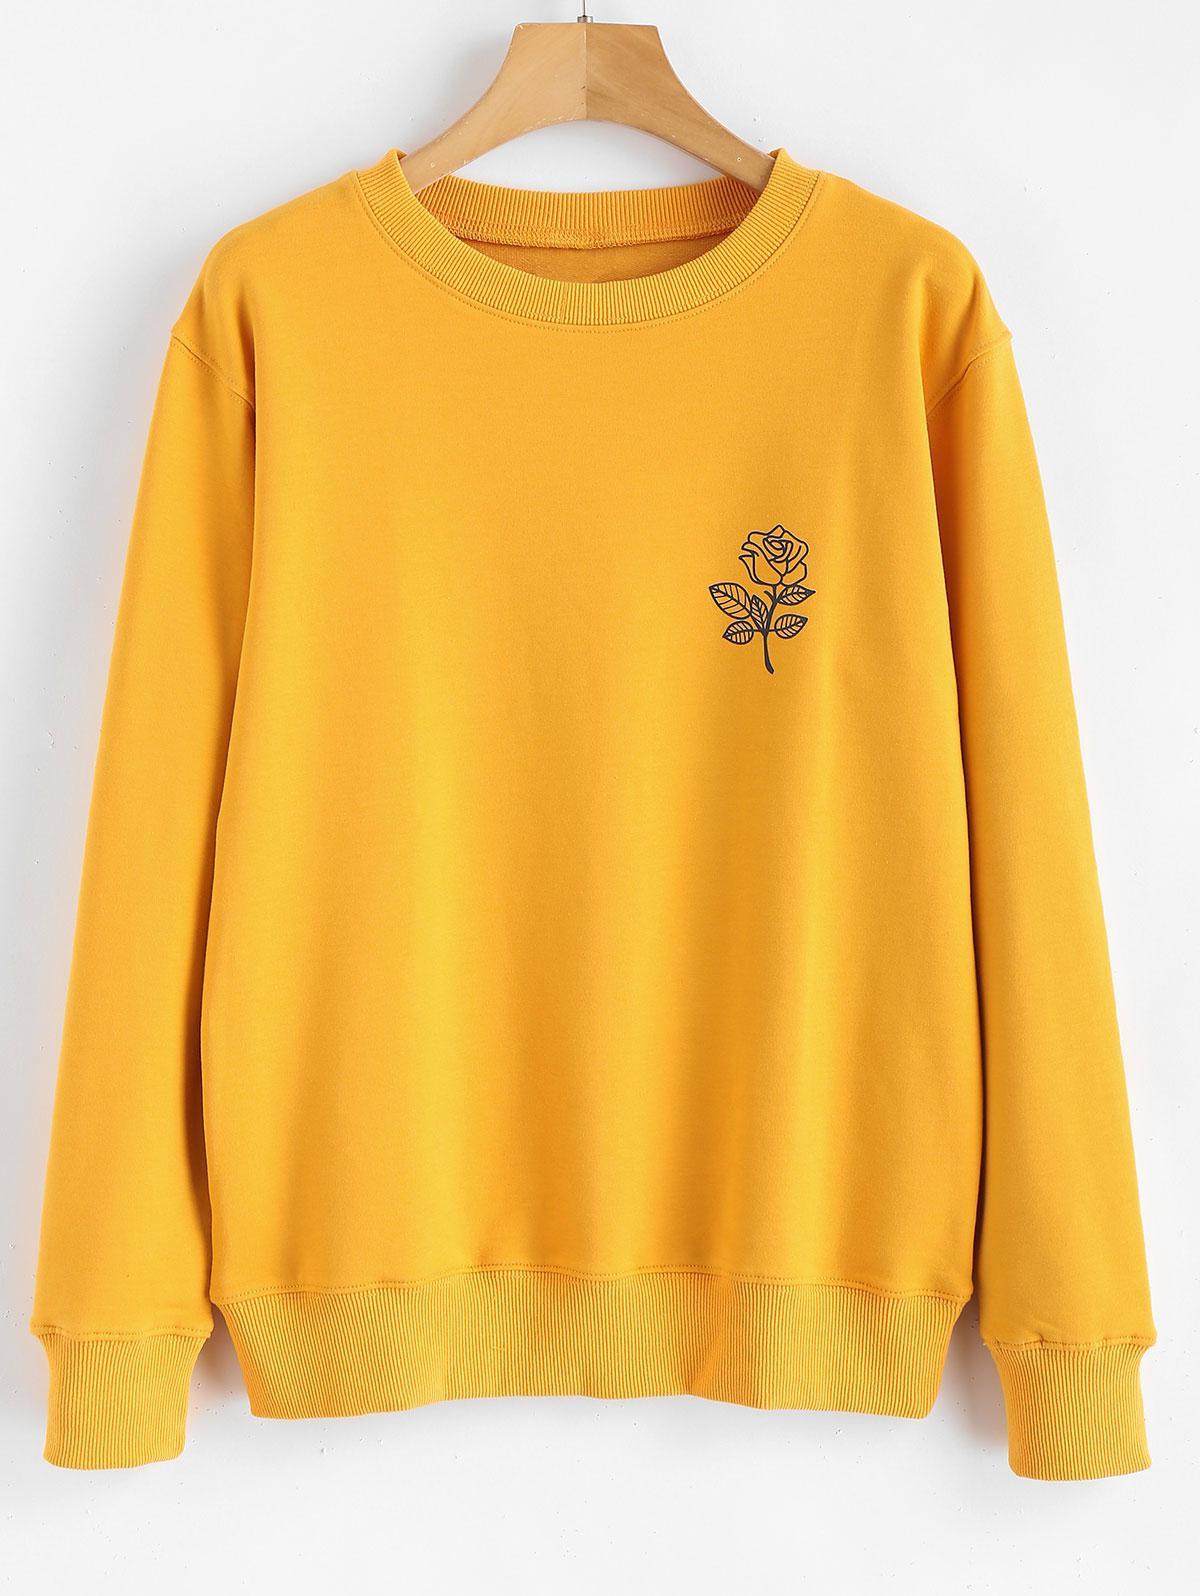 Floral Print Graphic Pullover Sweatshirt